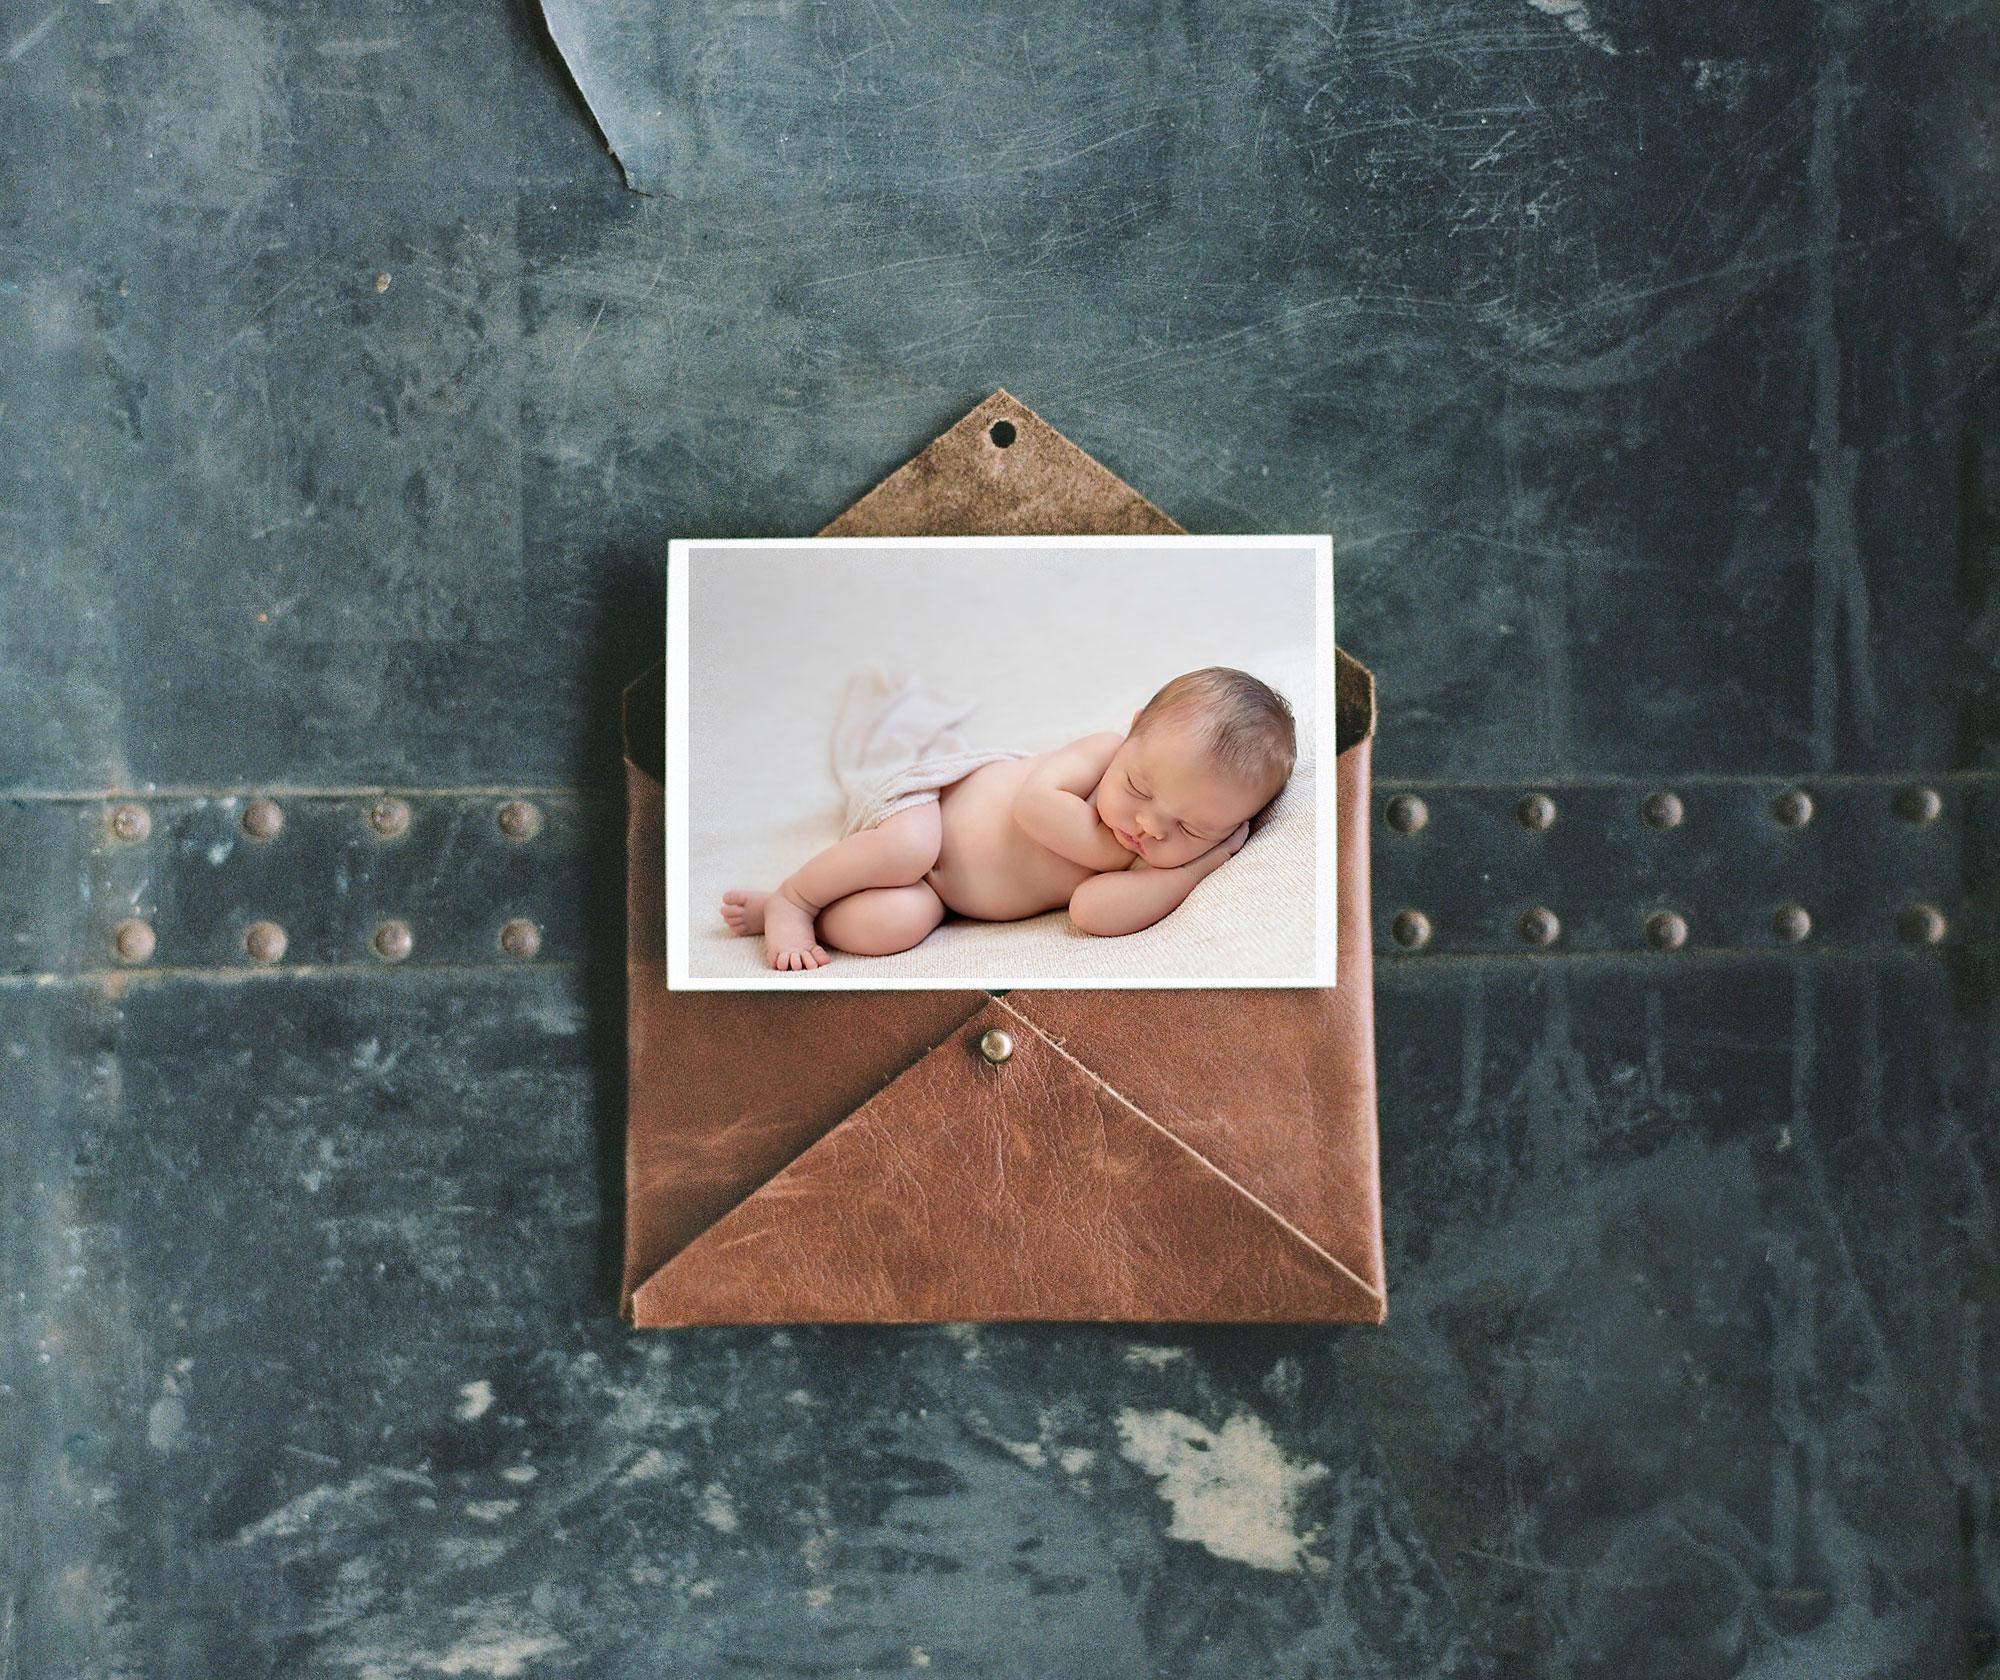 Leather-envelope-01.jpg